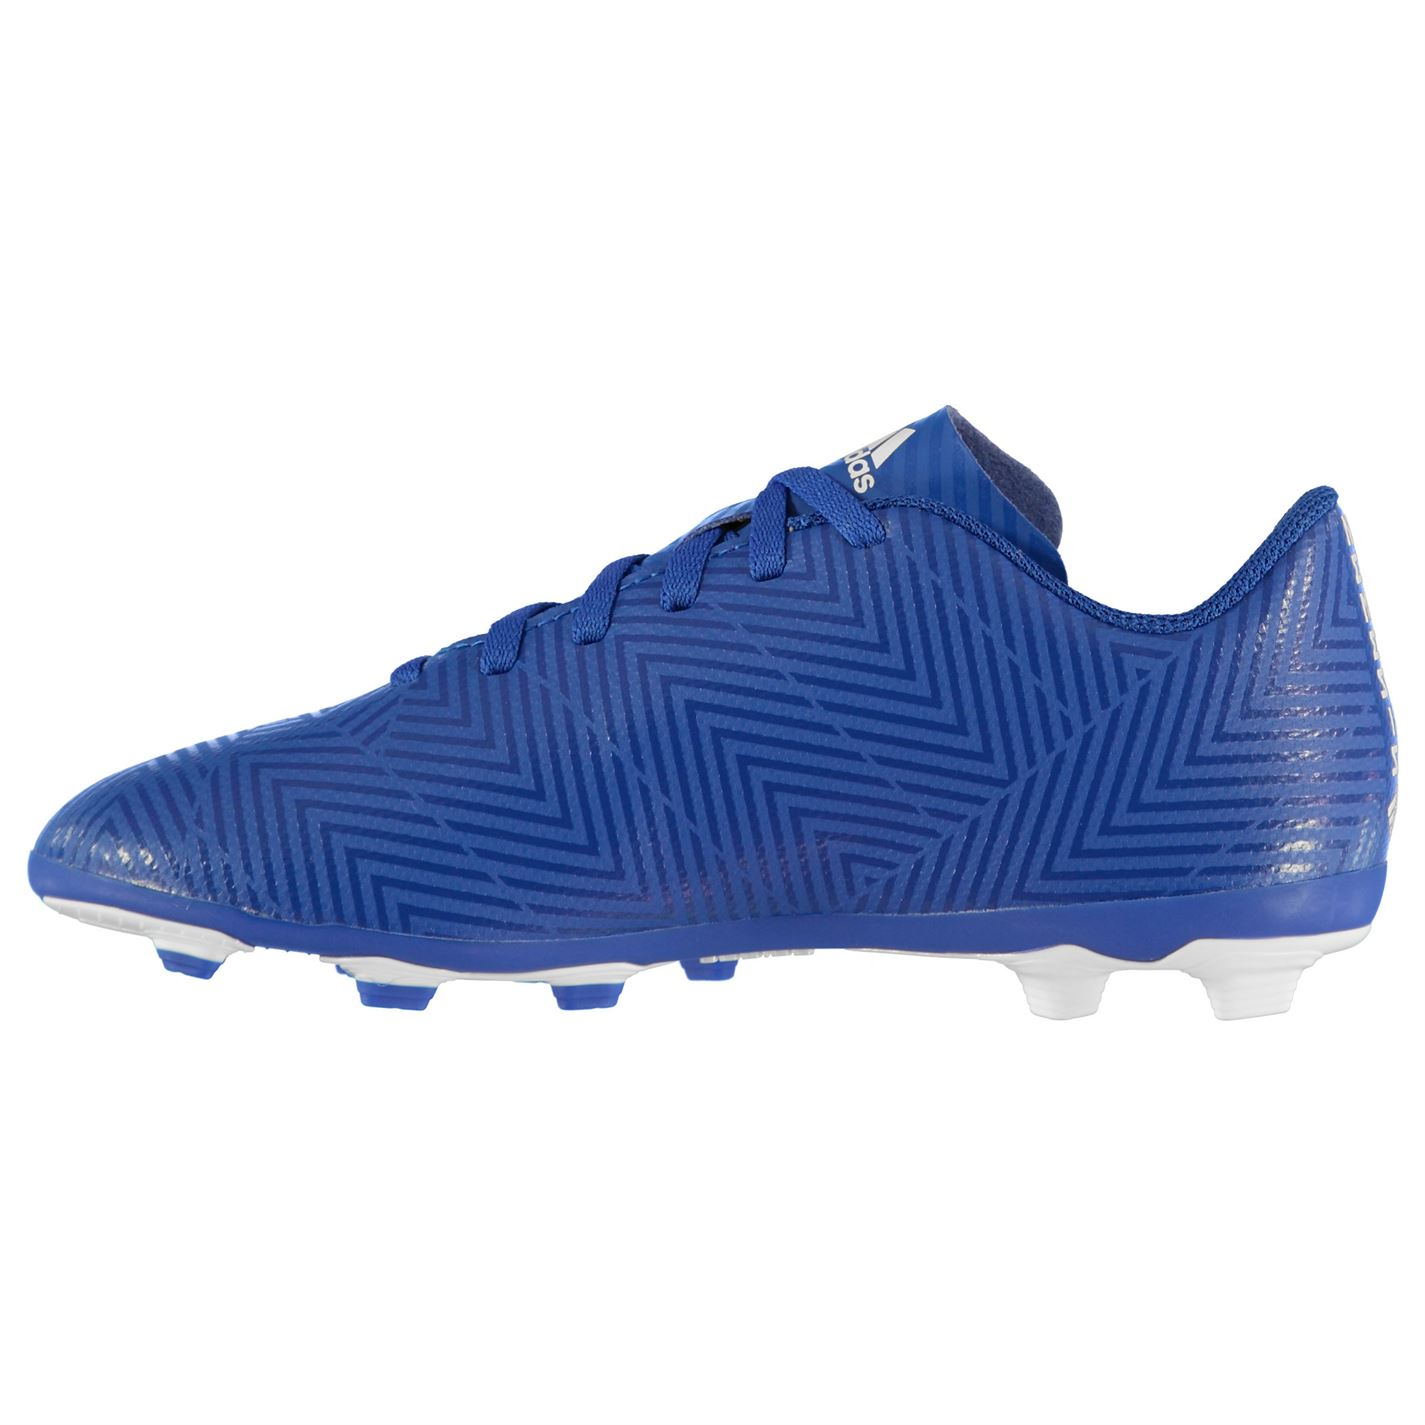 00448fcef Adidas Kids Boys Nemeziz 18.4 FG Child Football Boots Firm Ground ...